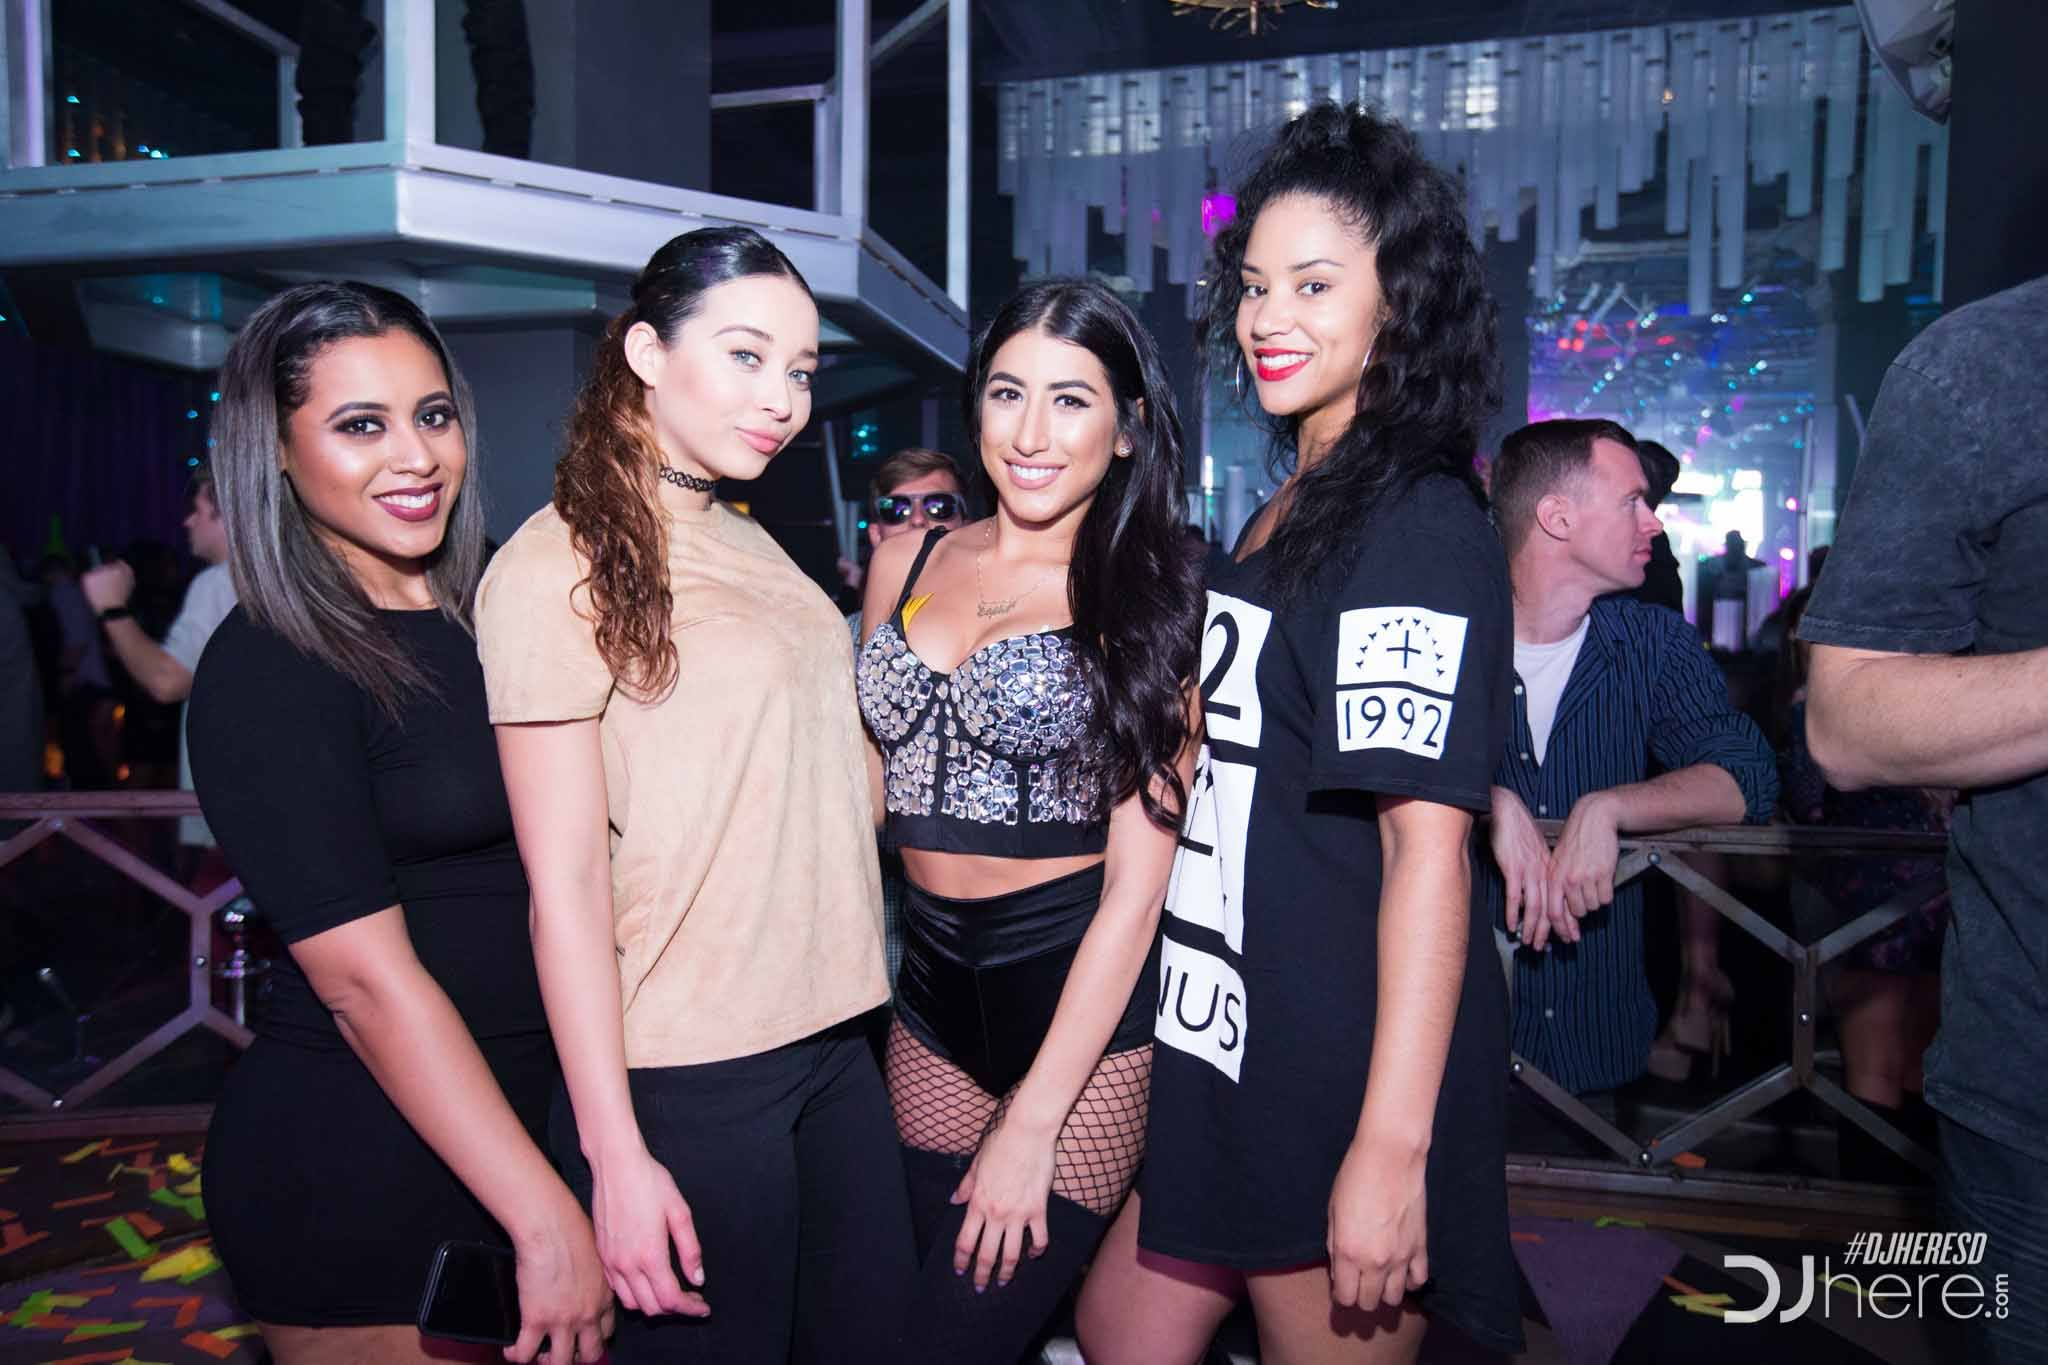 Scene at Parq Nightclub in San Diego